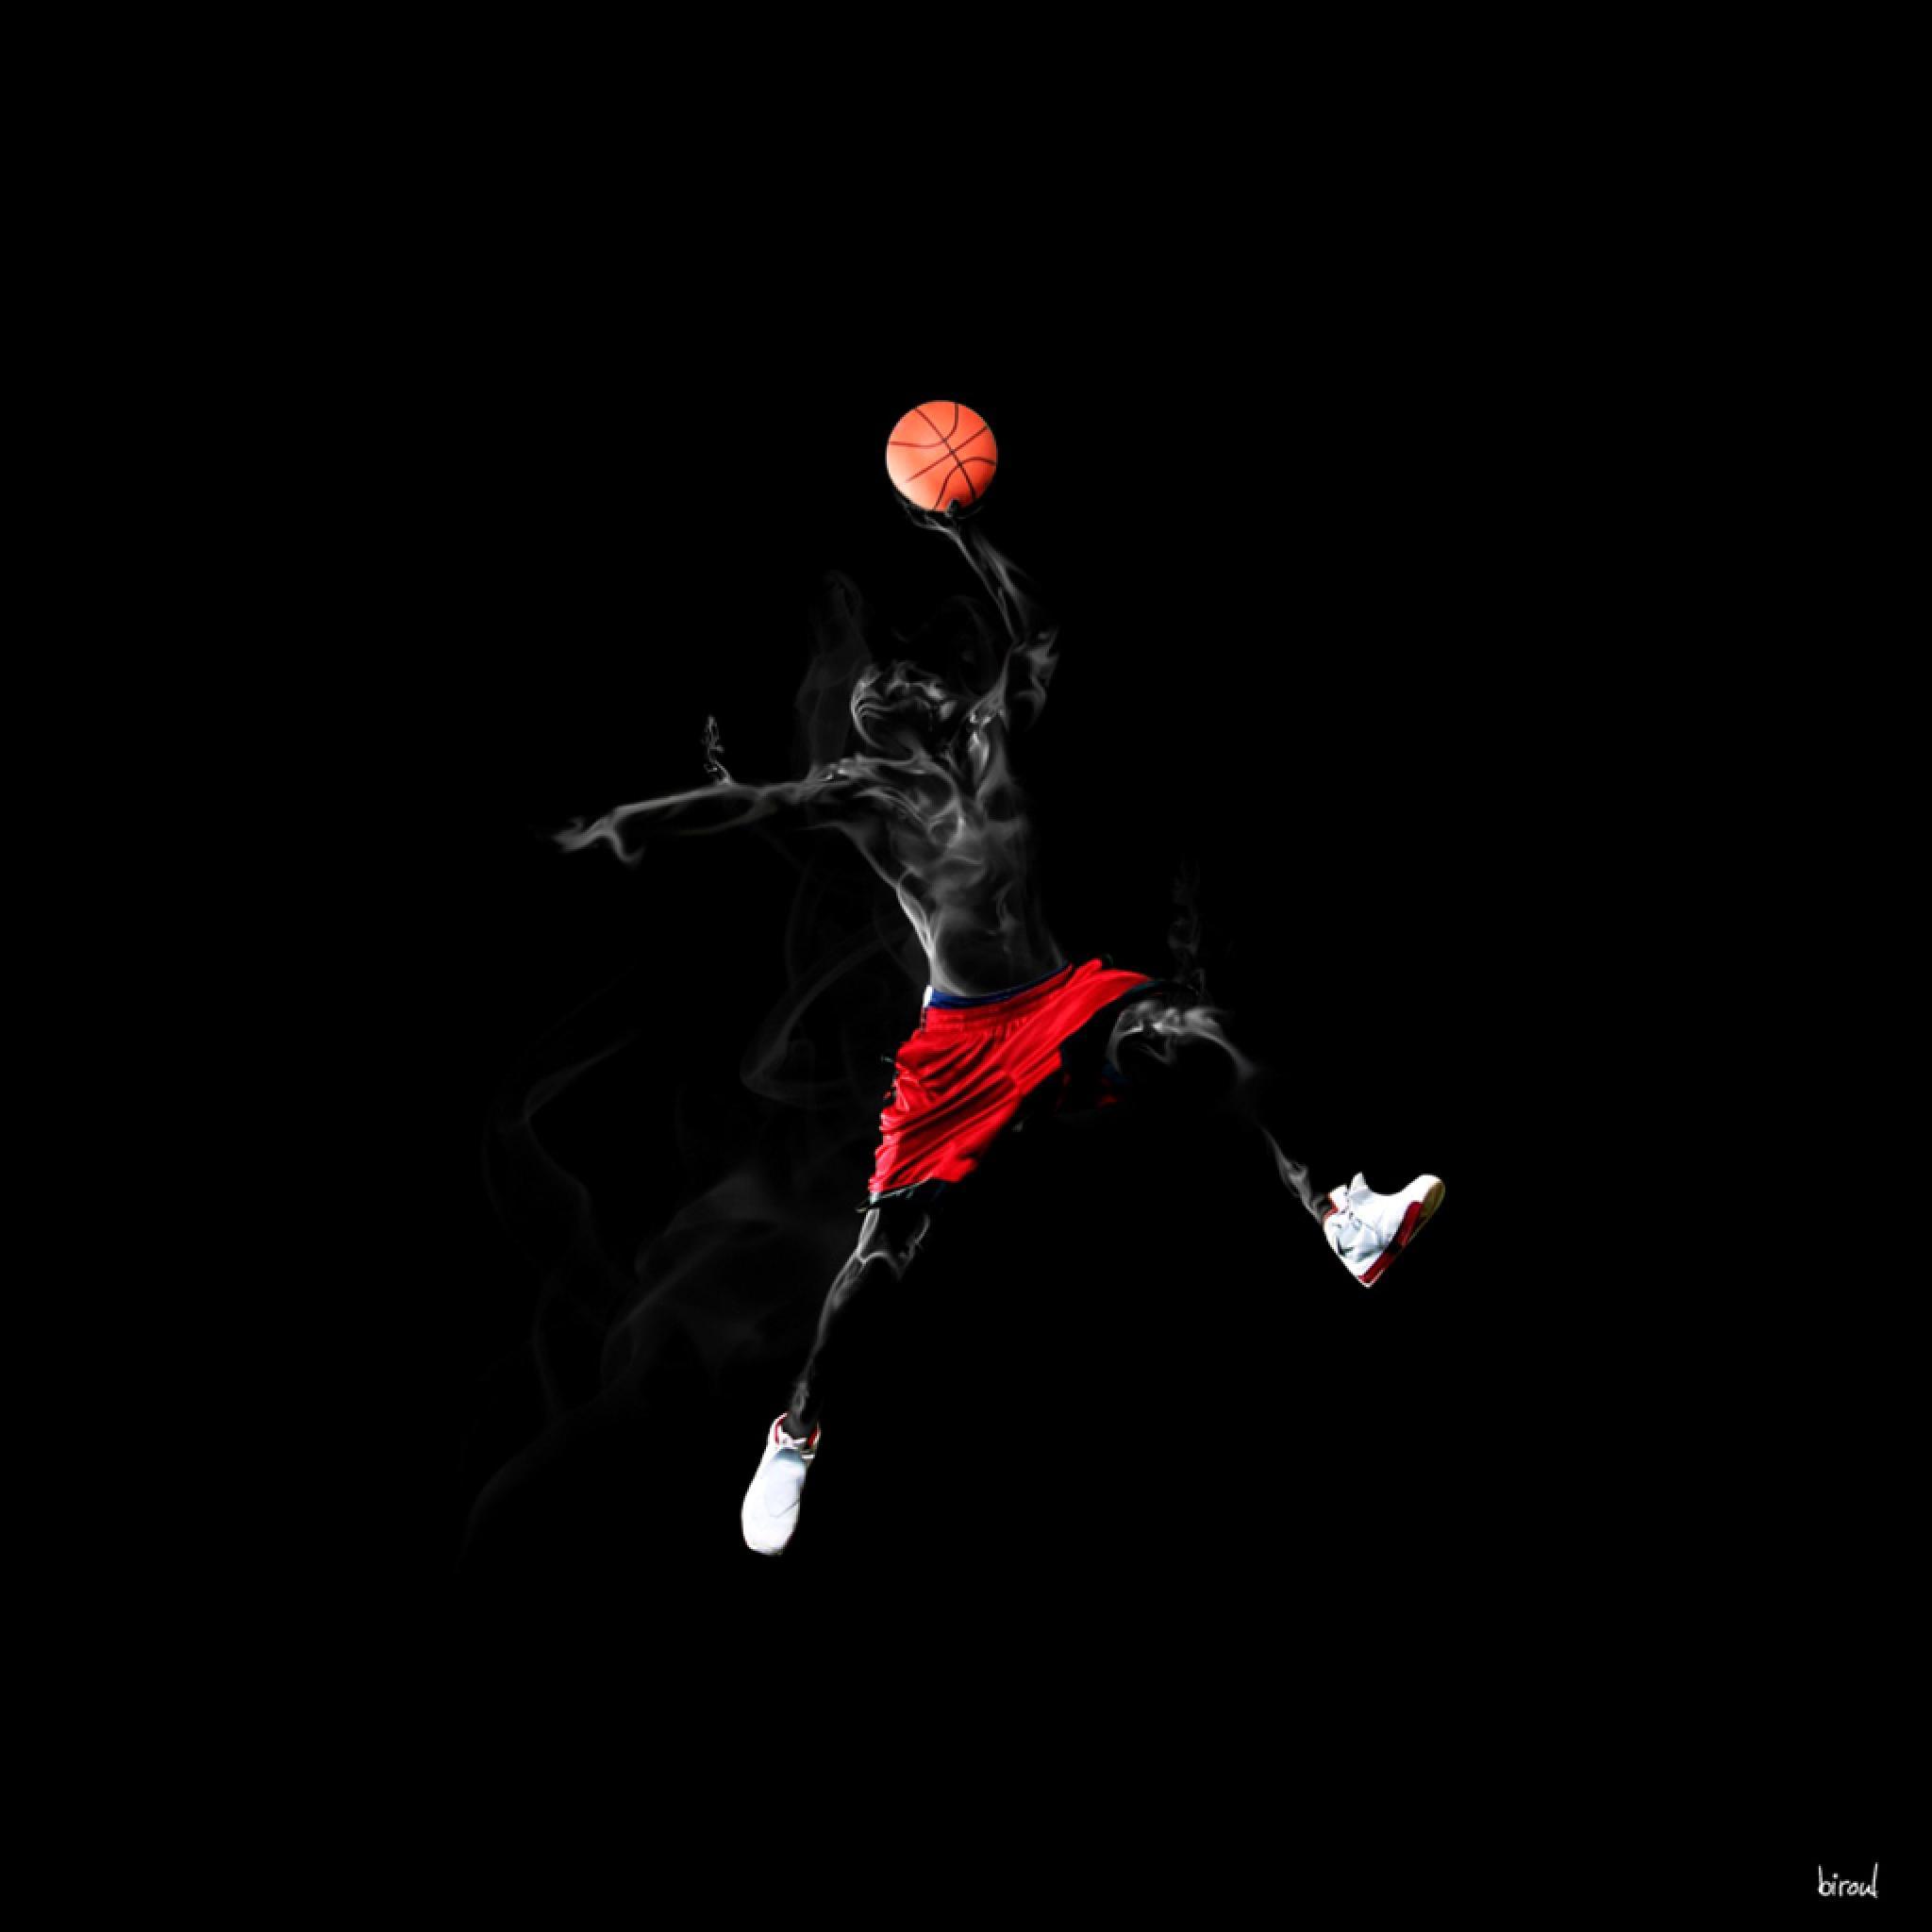 pin basketball wallpapers best pdfcastnet on pinterest